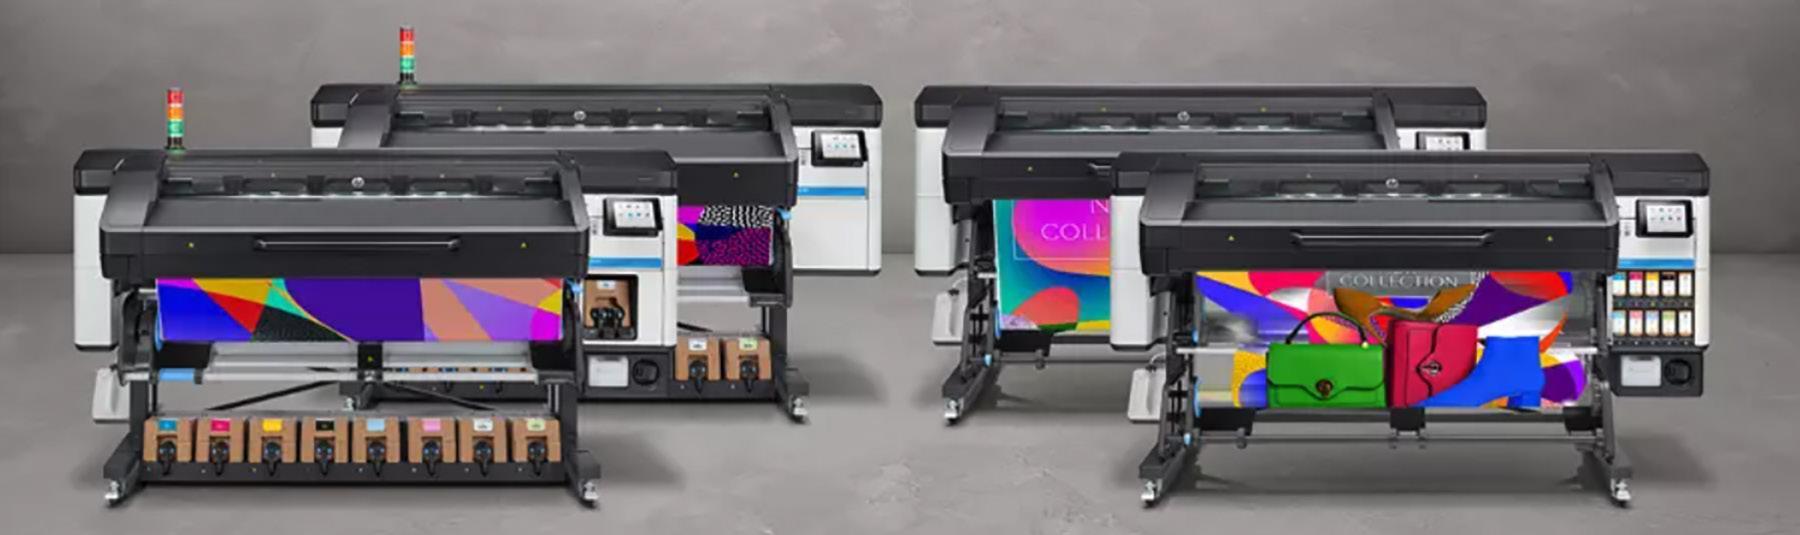 Page 44 of HP launches new latex printer portfolio